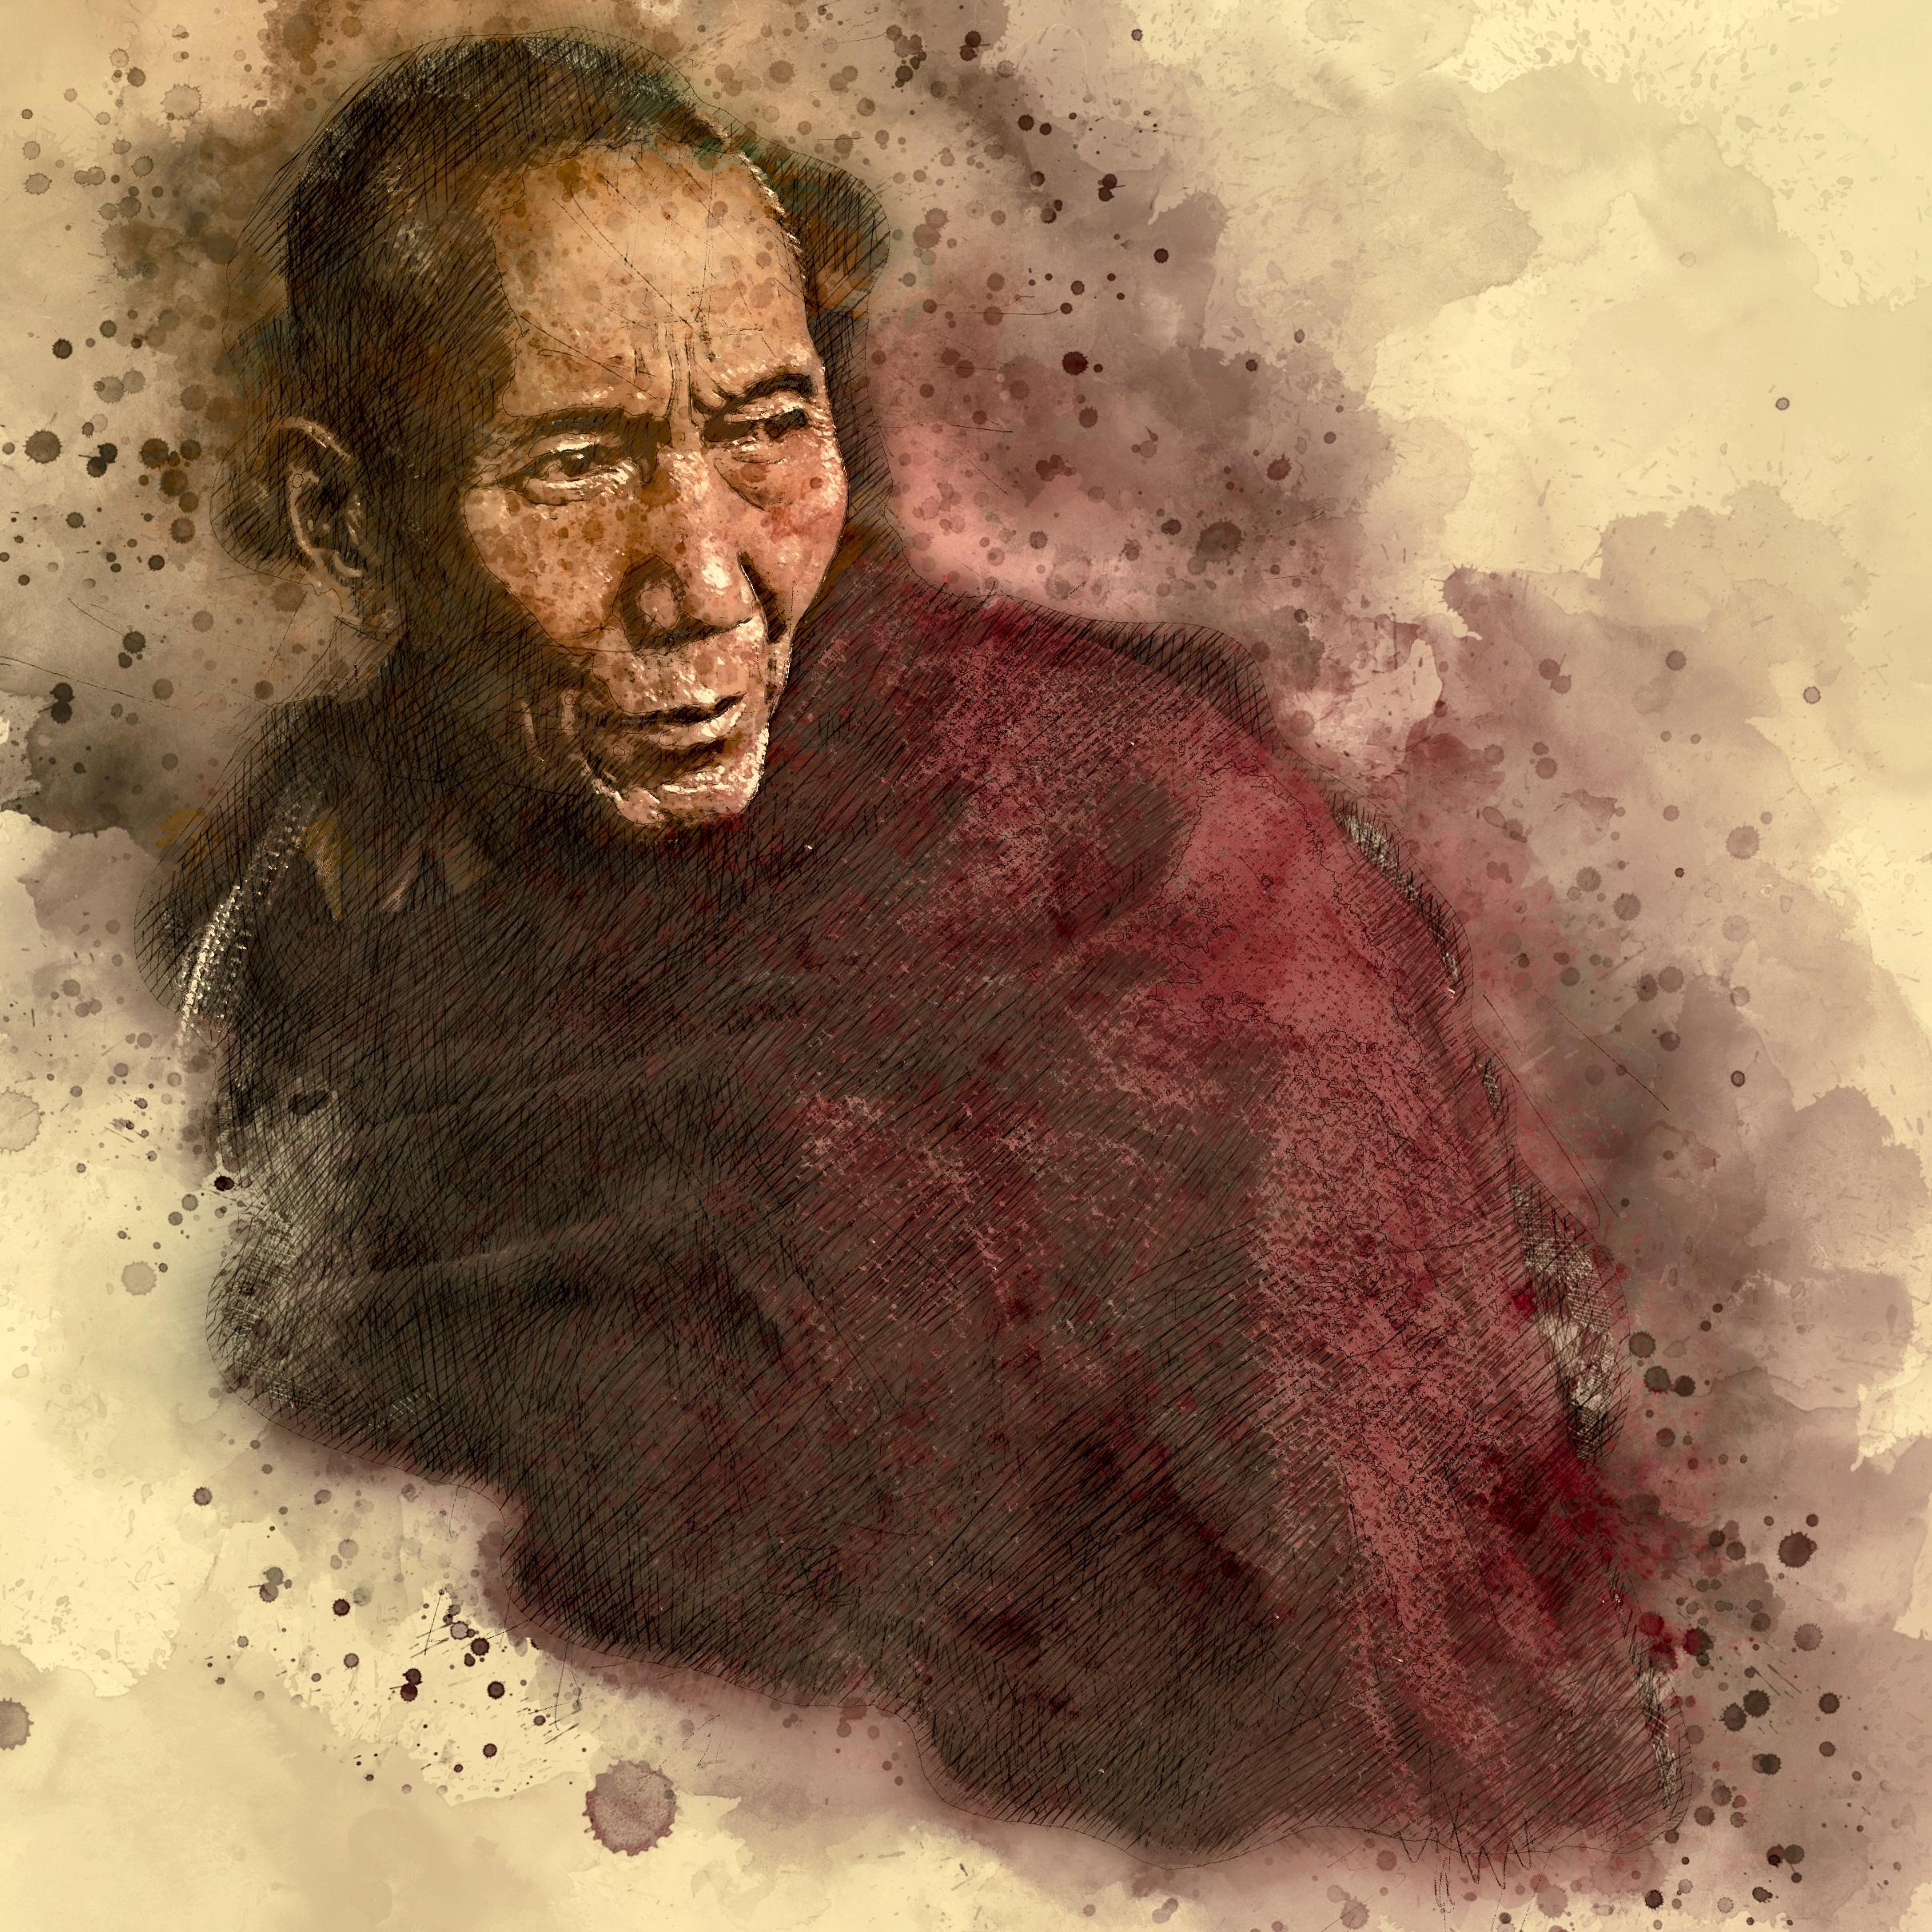 Fotos gratis : hombre, persona, masculino, retrato, budismo, humano ...